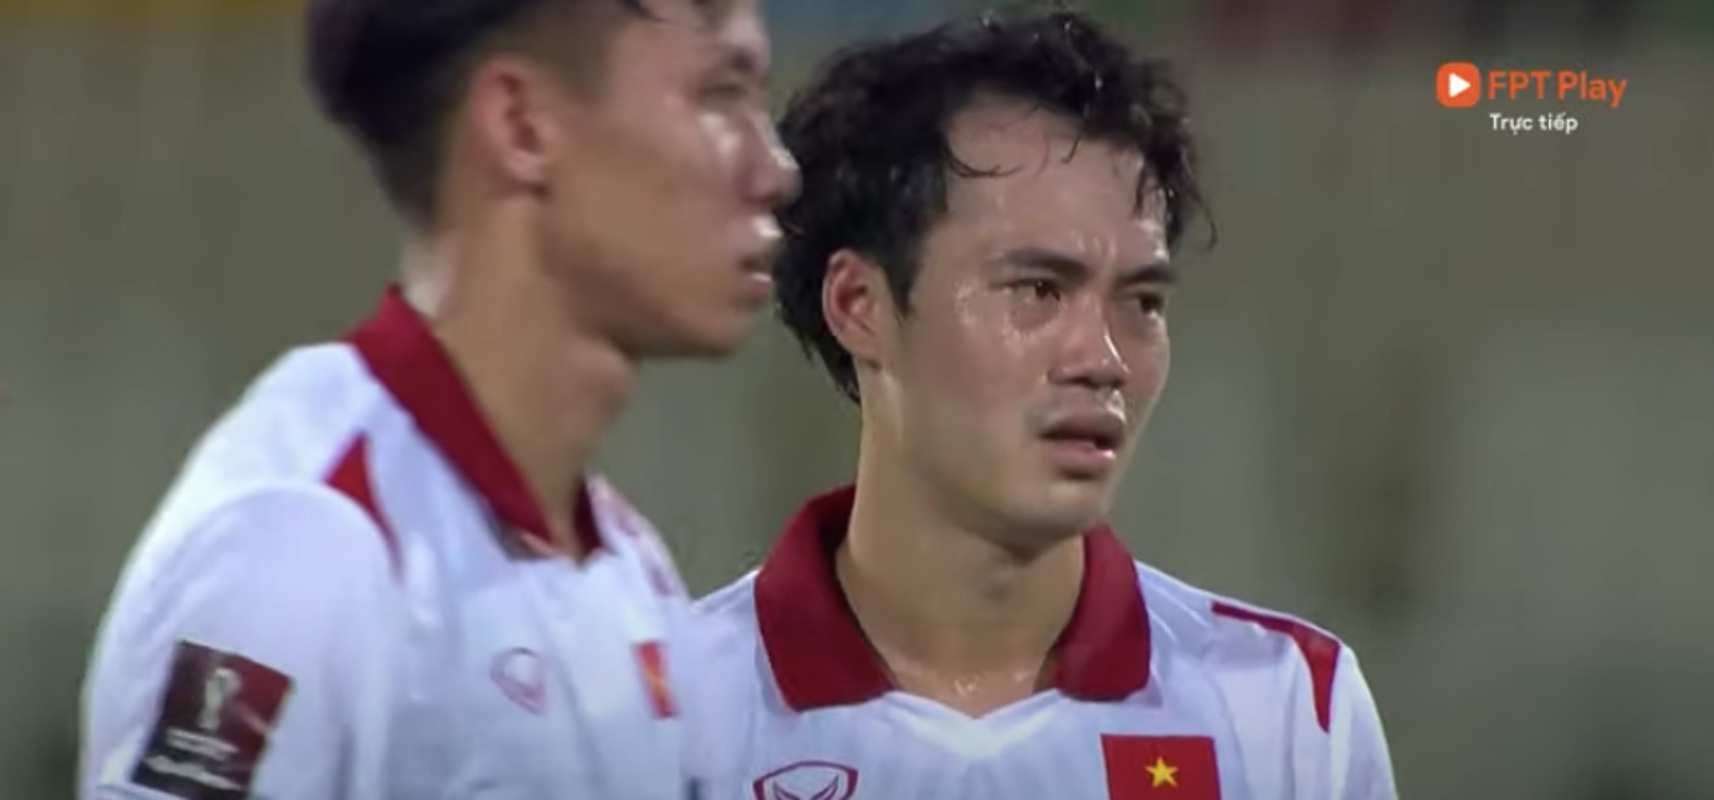 Thua Trung Quoc, cau thu doi tuyen Viet Nam roi le fan xot xa-Hinh-7